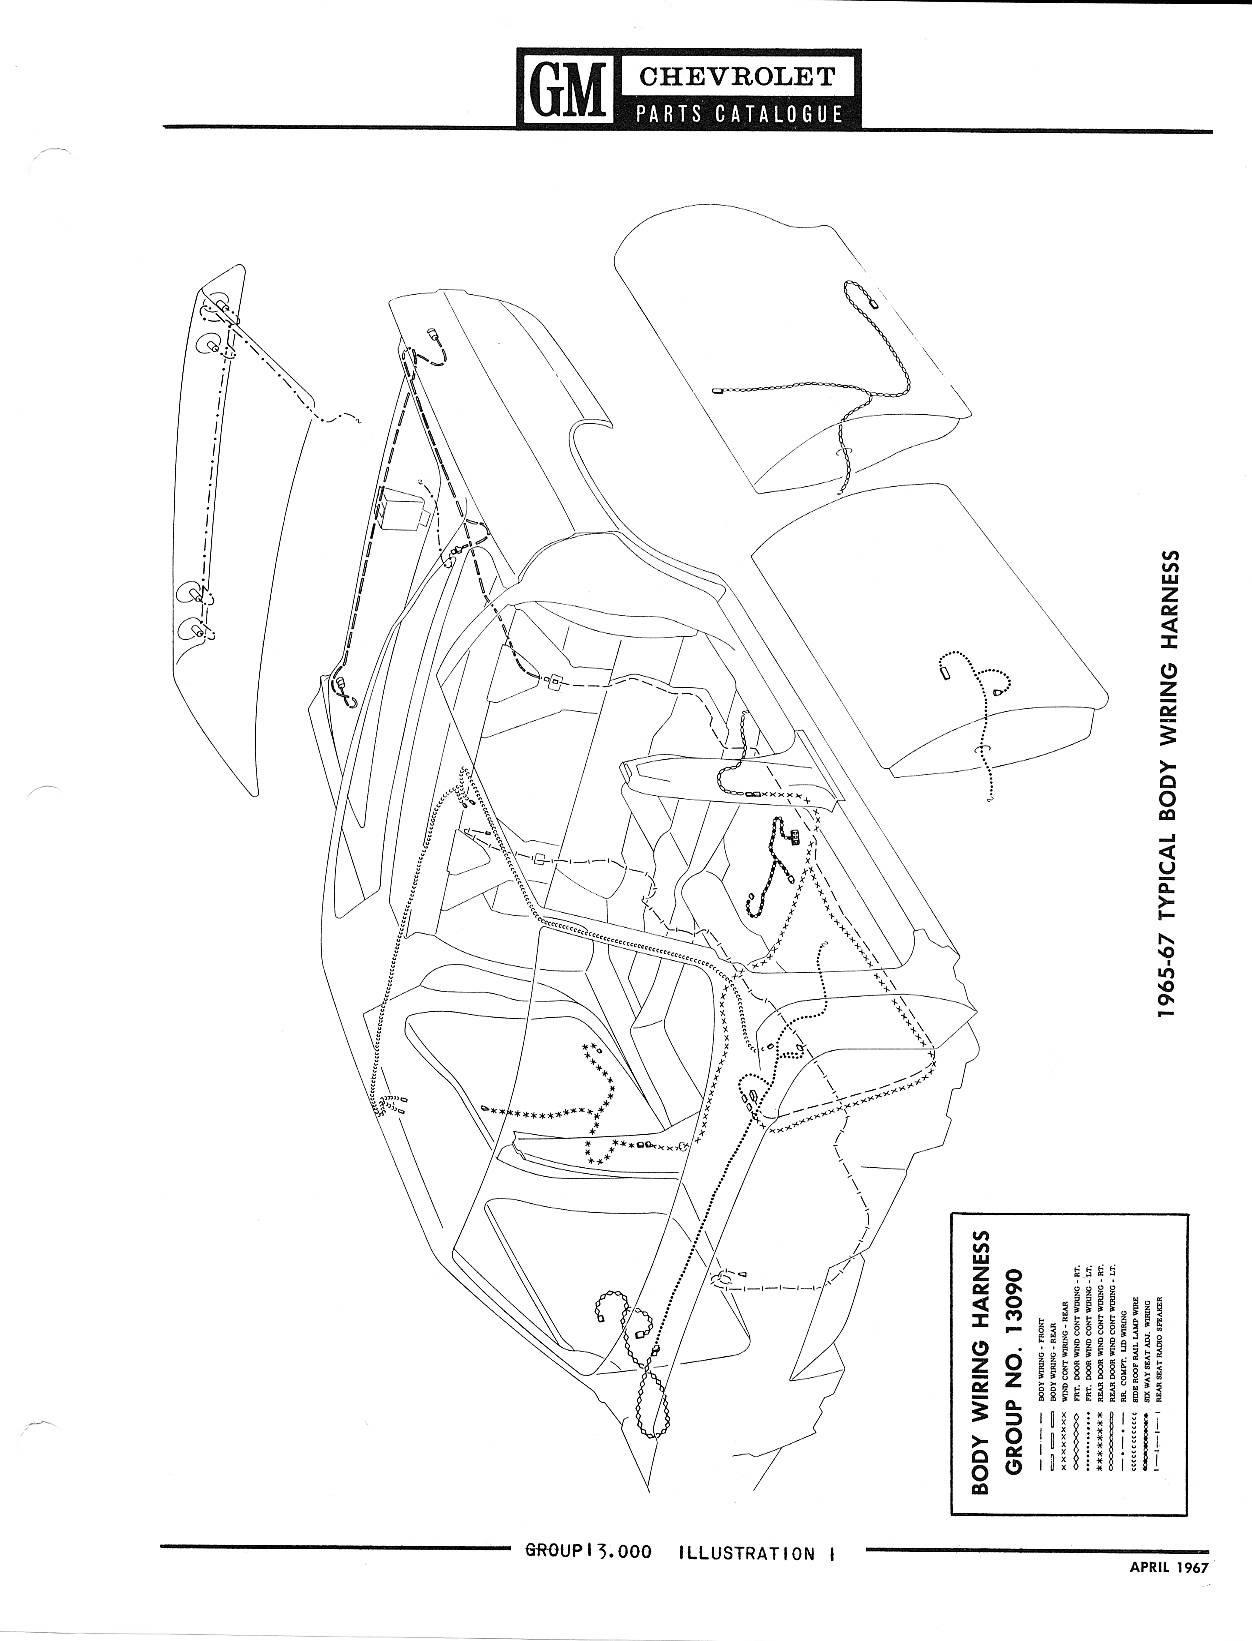 1958-1968 Chevrolet Parts Catalog / Image189.jpg